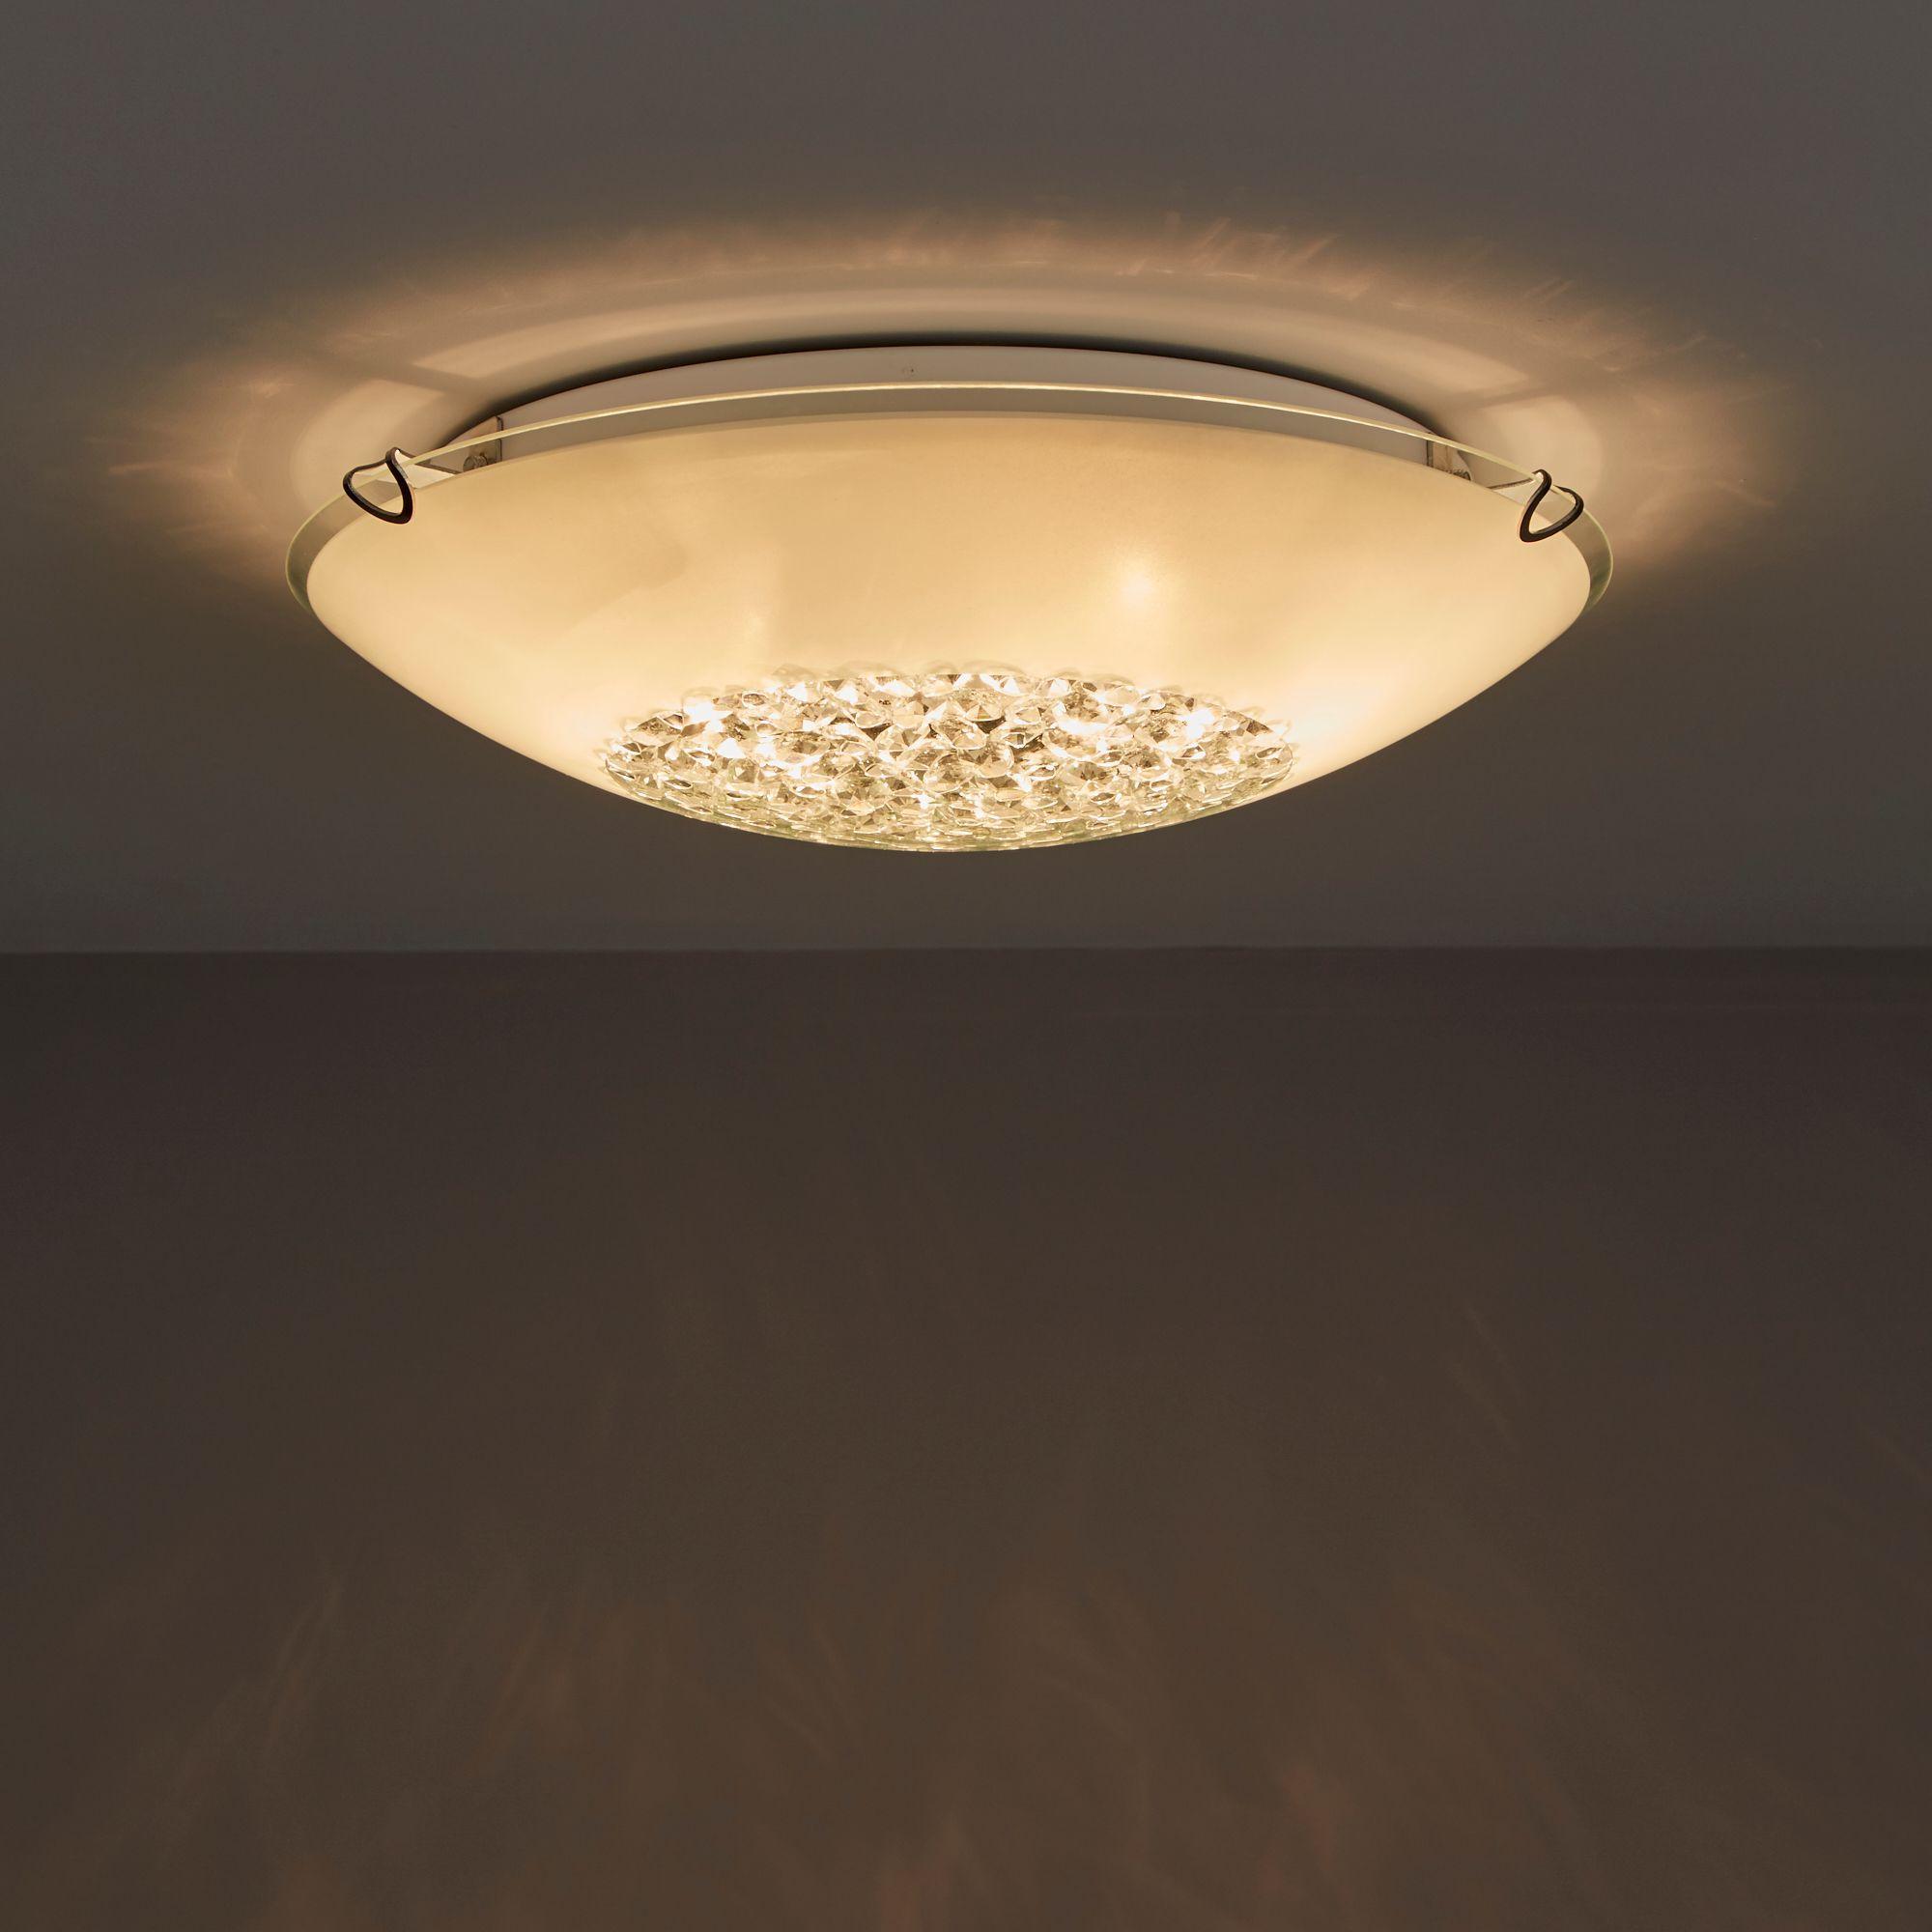 gaia white  lamp ceiling light departments diy  bq